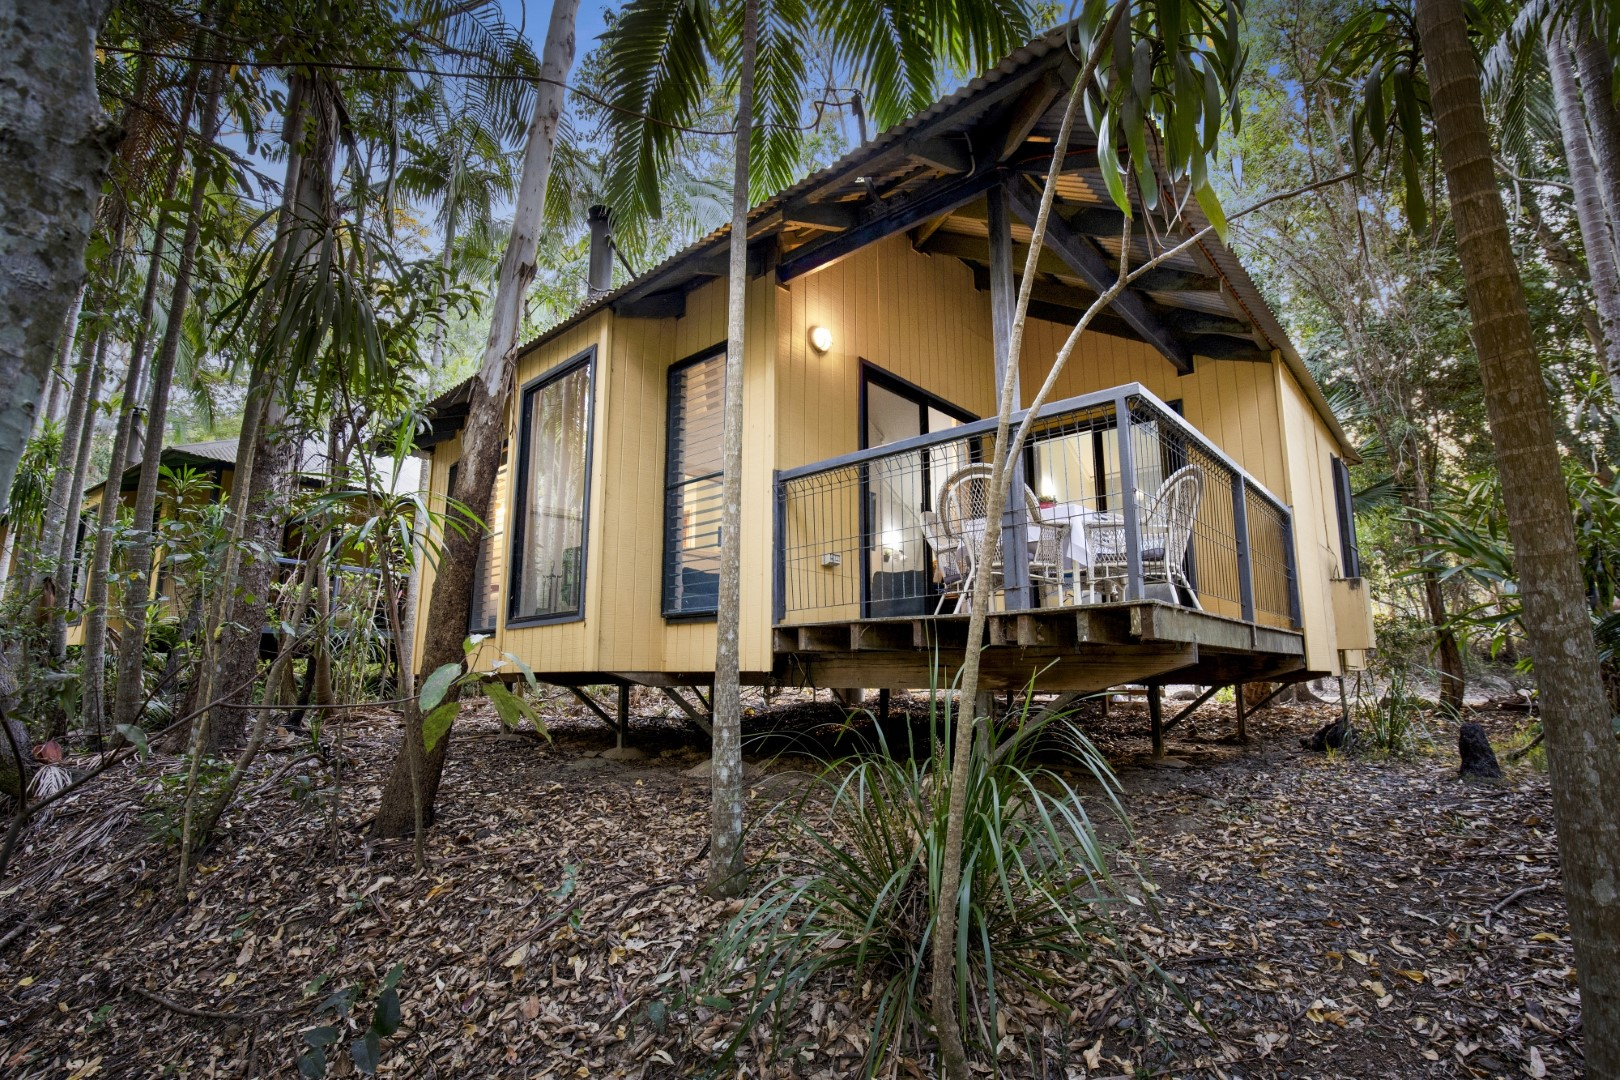 Cedar Creek Lodges at Thunderbird Park